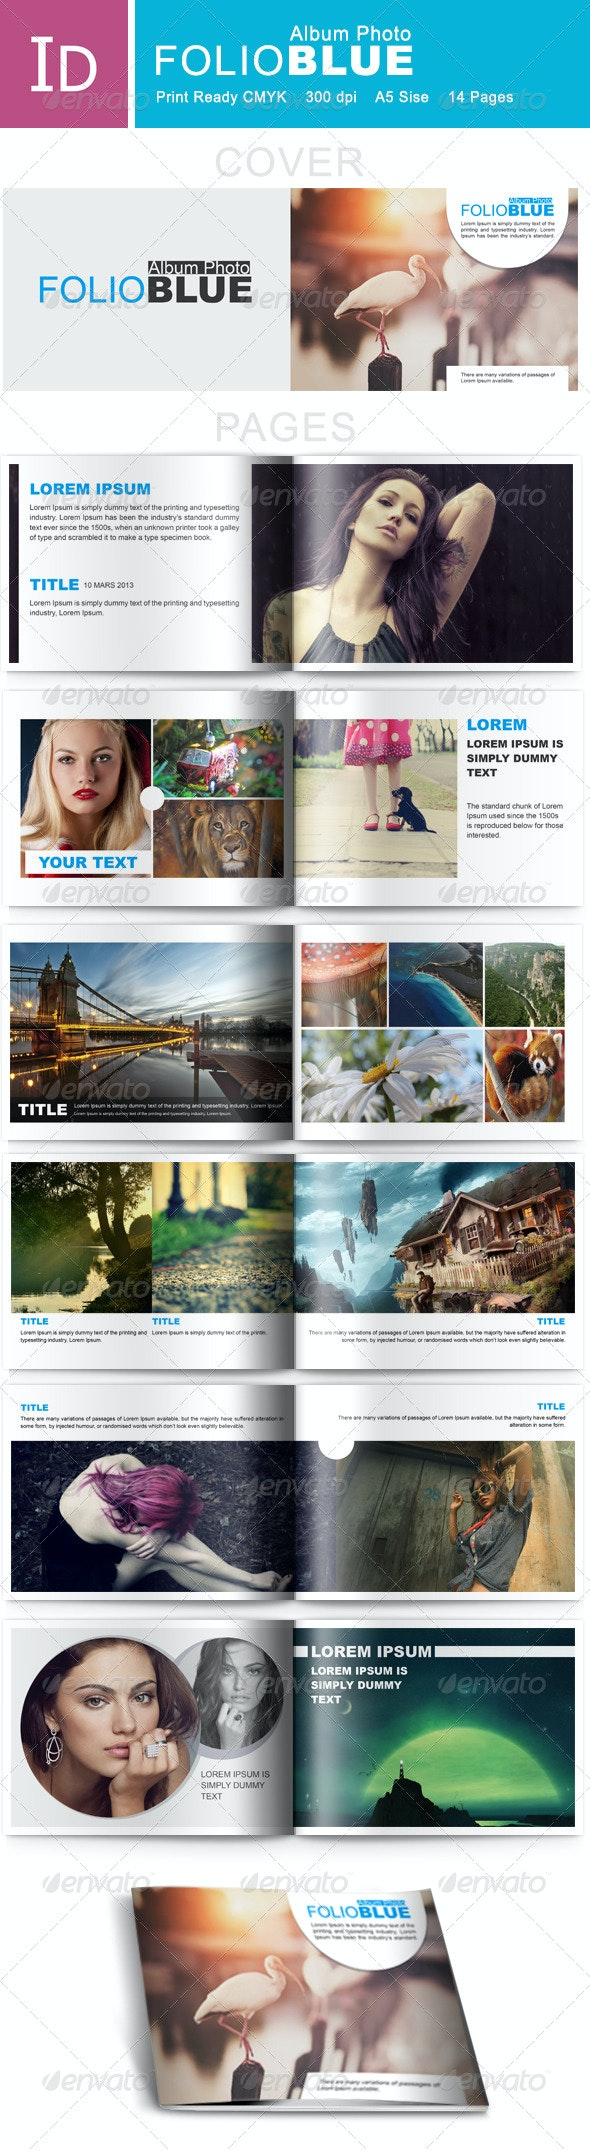 FolioBlue - Album Photo  - Photo Albums Print Templates